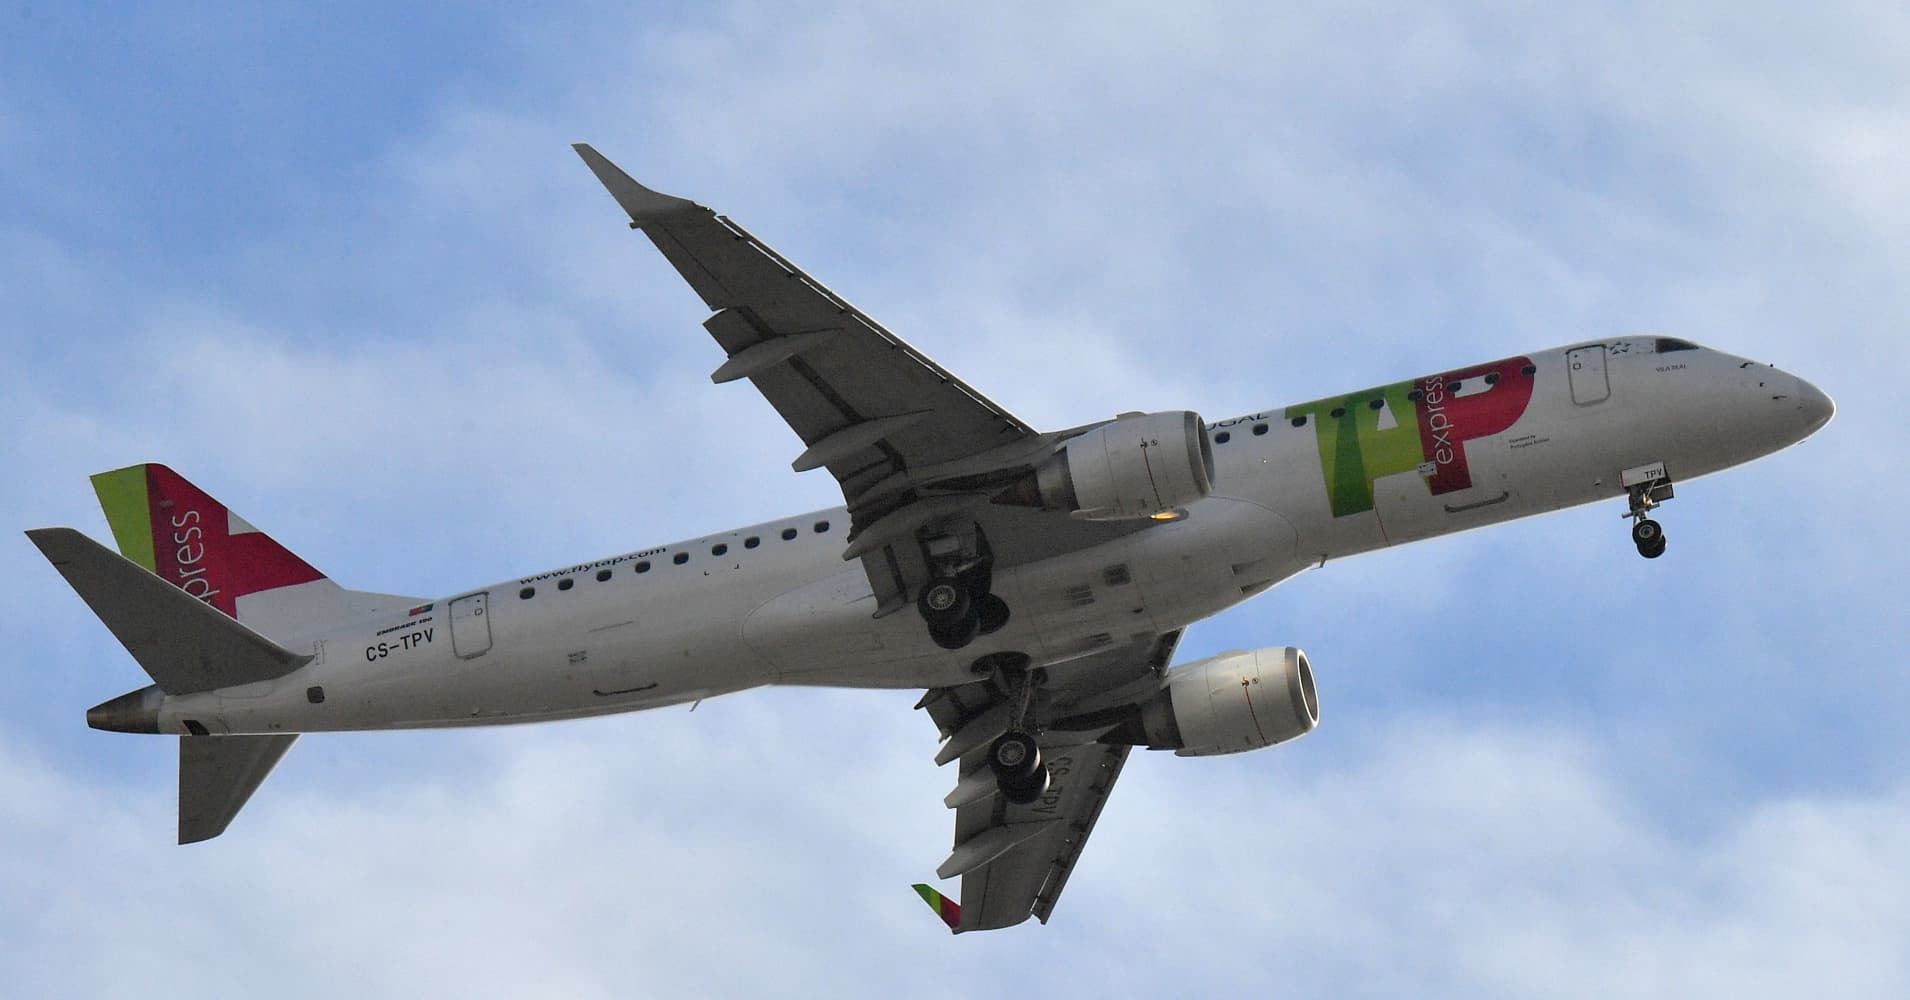 106 passengers stranded in Germany due to drunken co-pilot